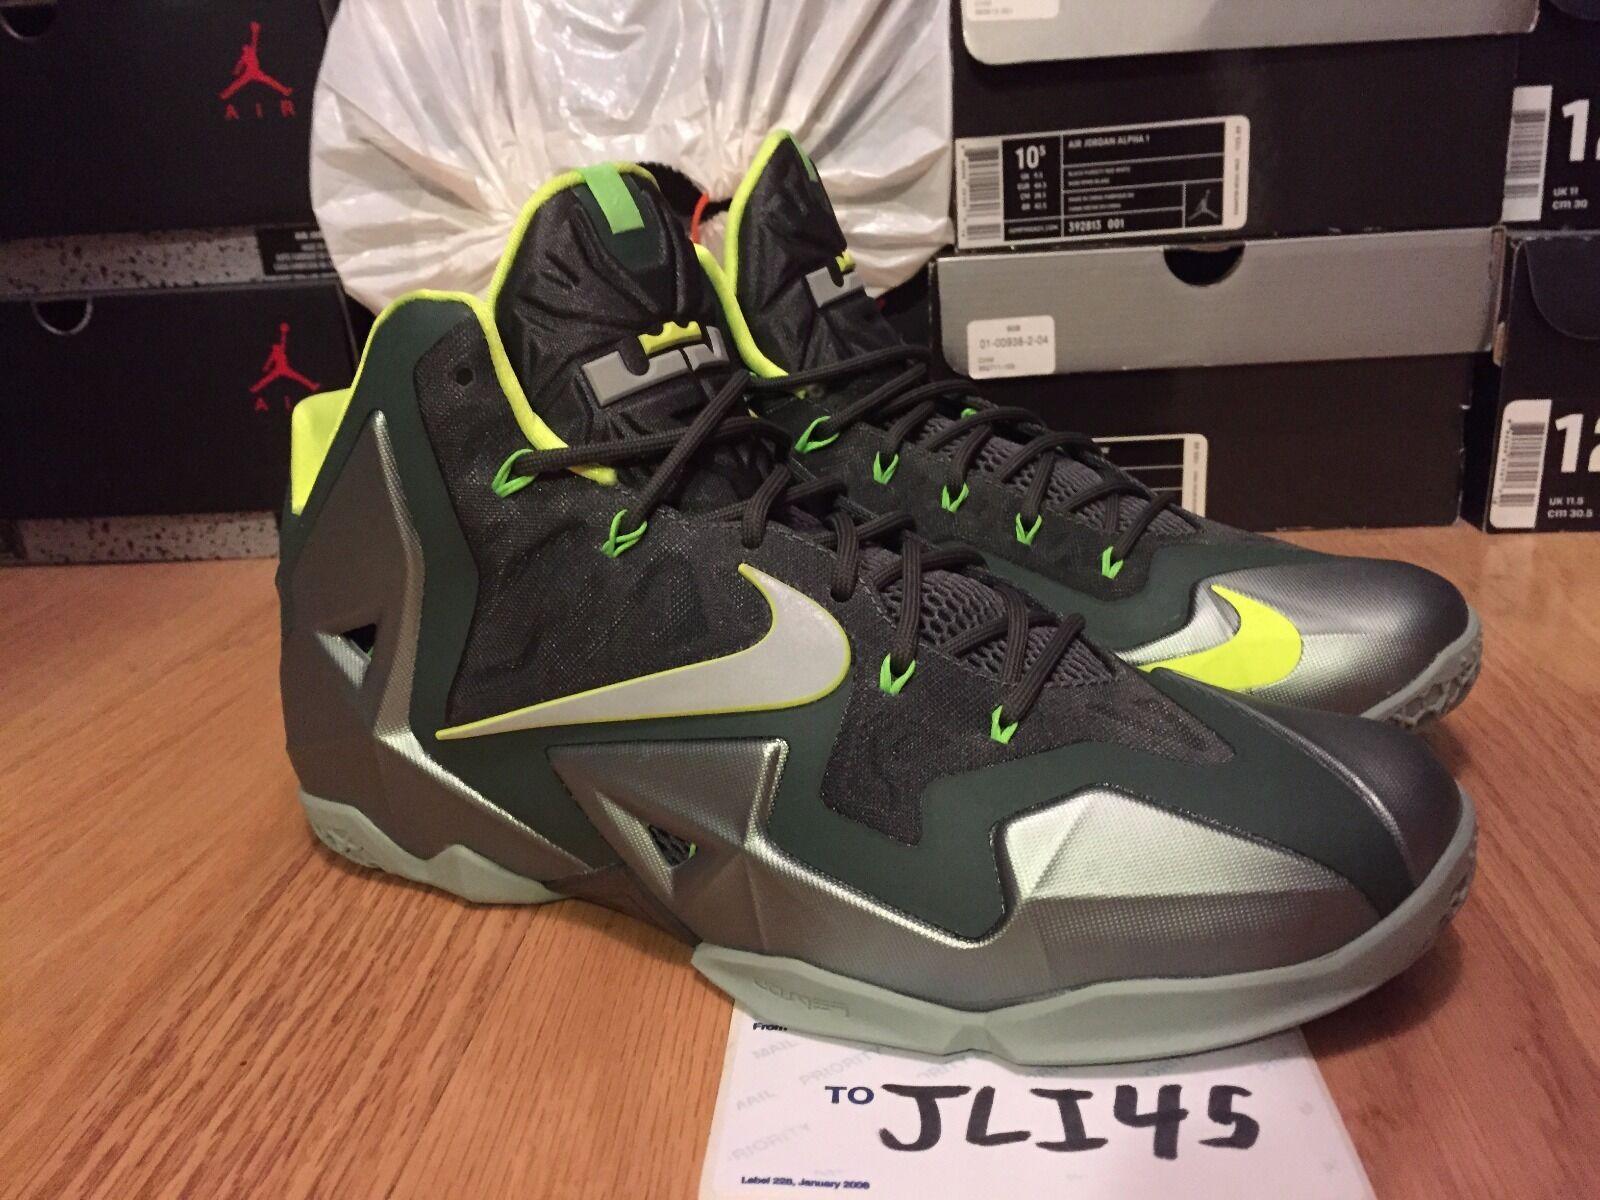 Men's Nike Lebron 11 XI Dunkman Size 11 Shoes Sneakers New DS Air Jordan